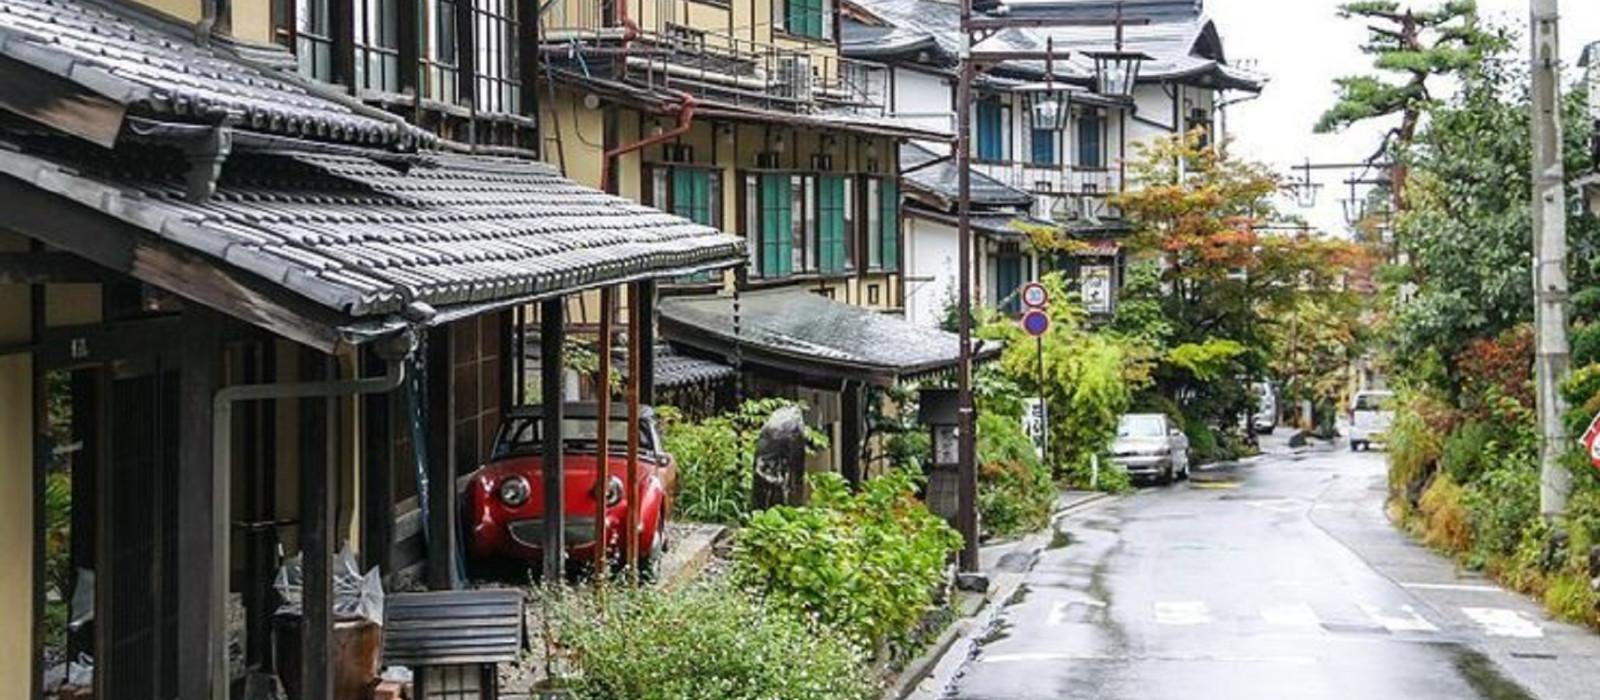 Destination Yudanaka Onsen Japan